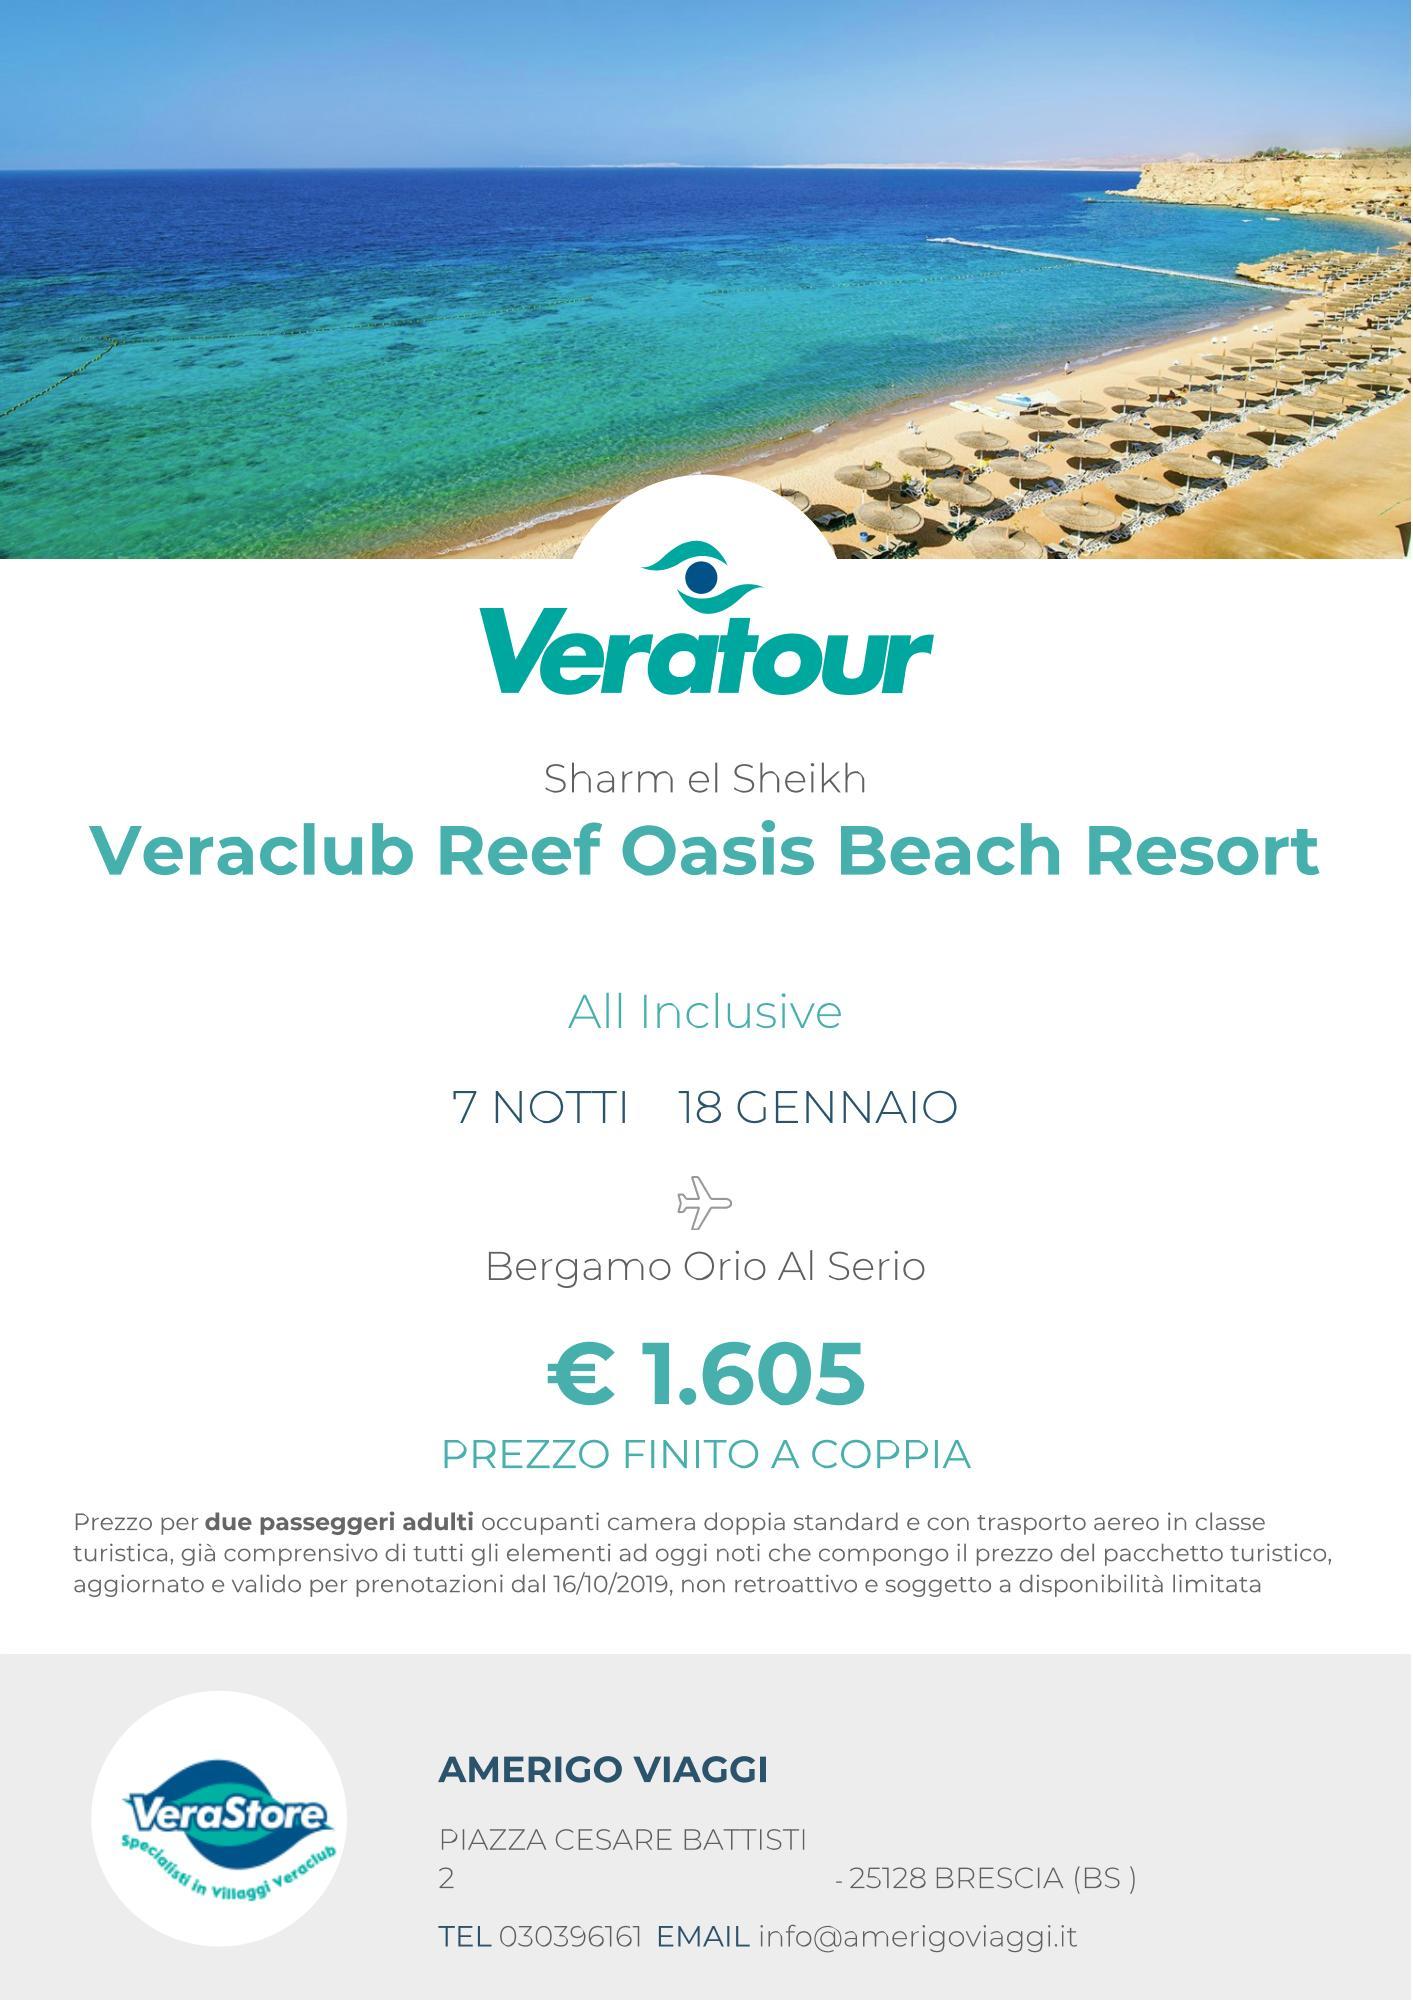 box_Veraclub Reef Oasis Beach Resort_pag